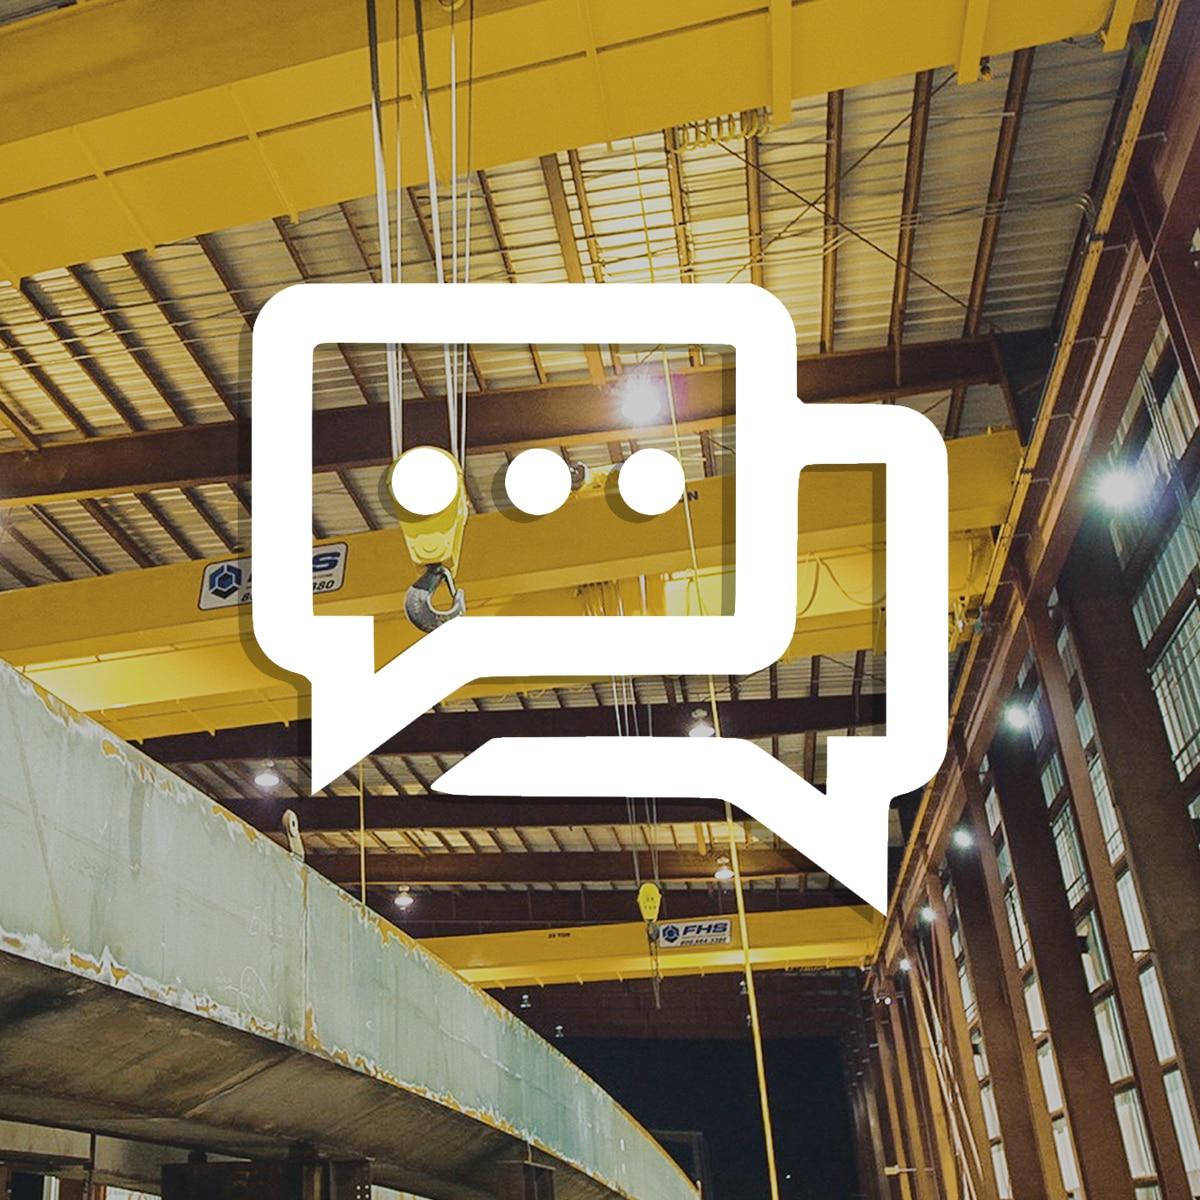 Contact Overhead Cranes Division 2